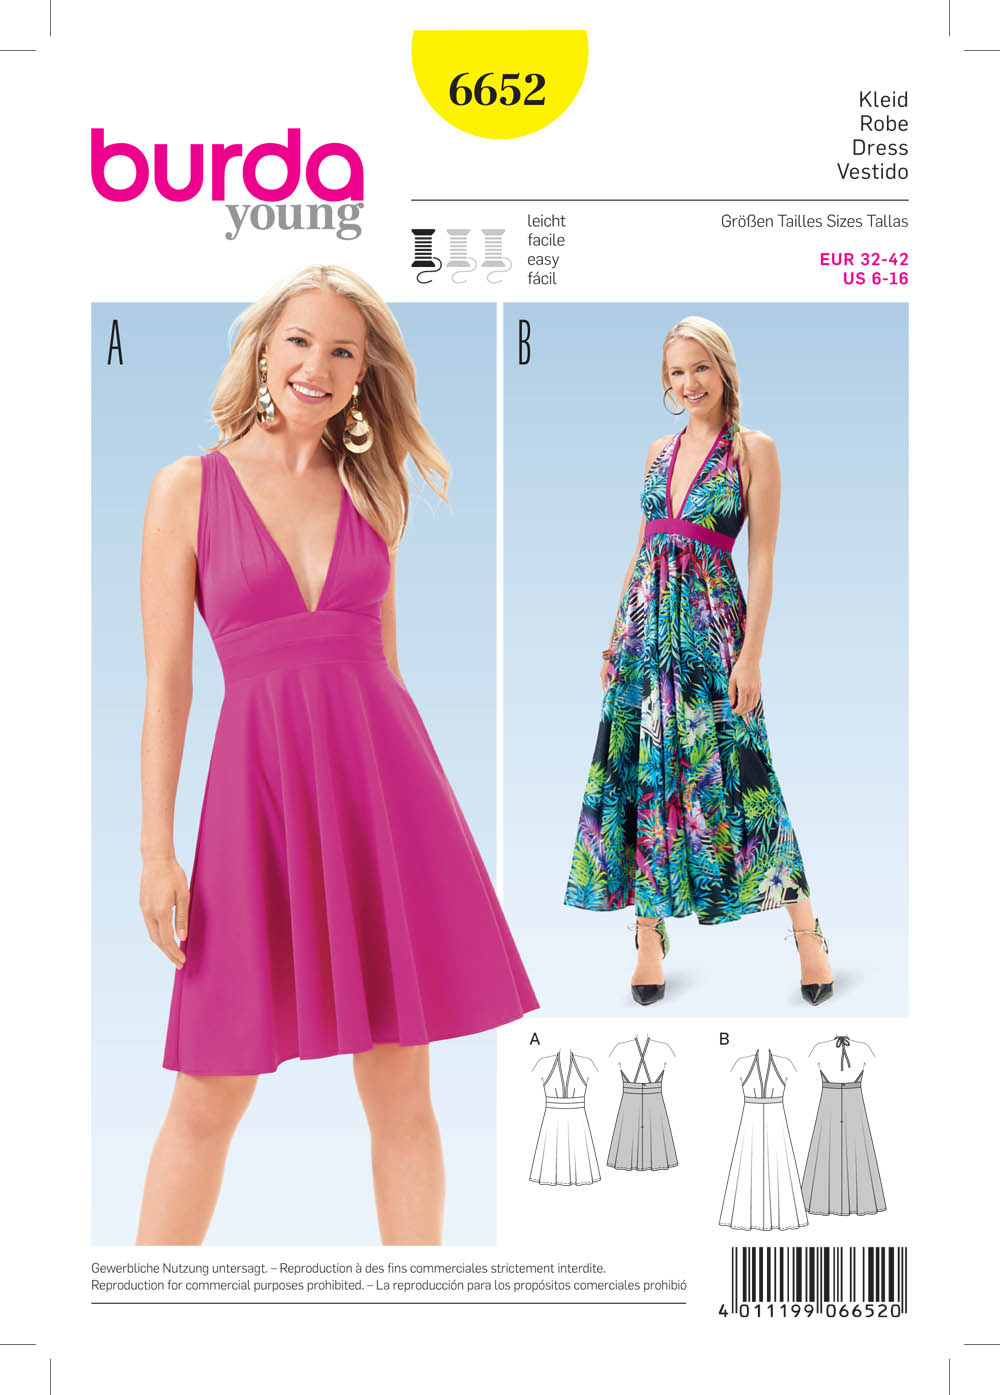 Burda 6652 Misses' Dress